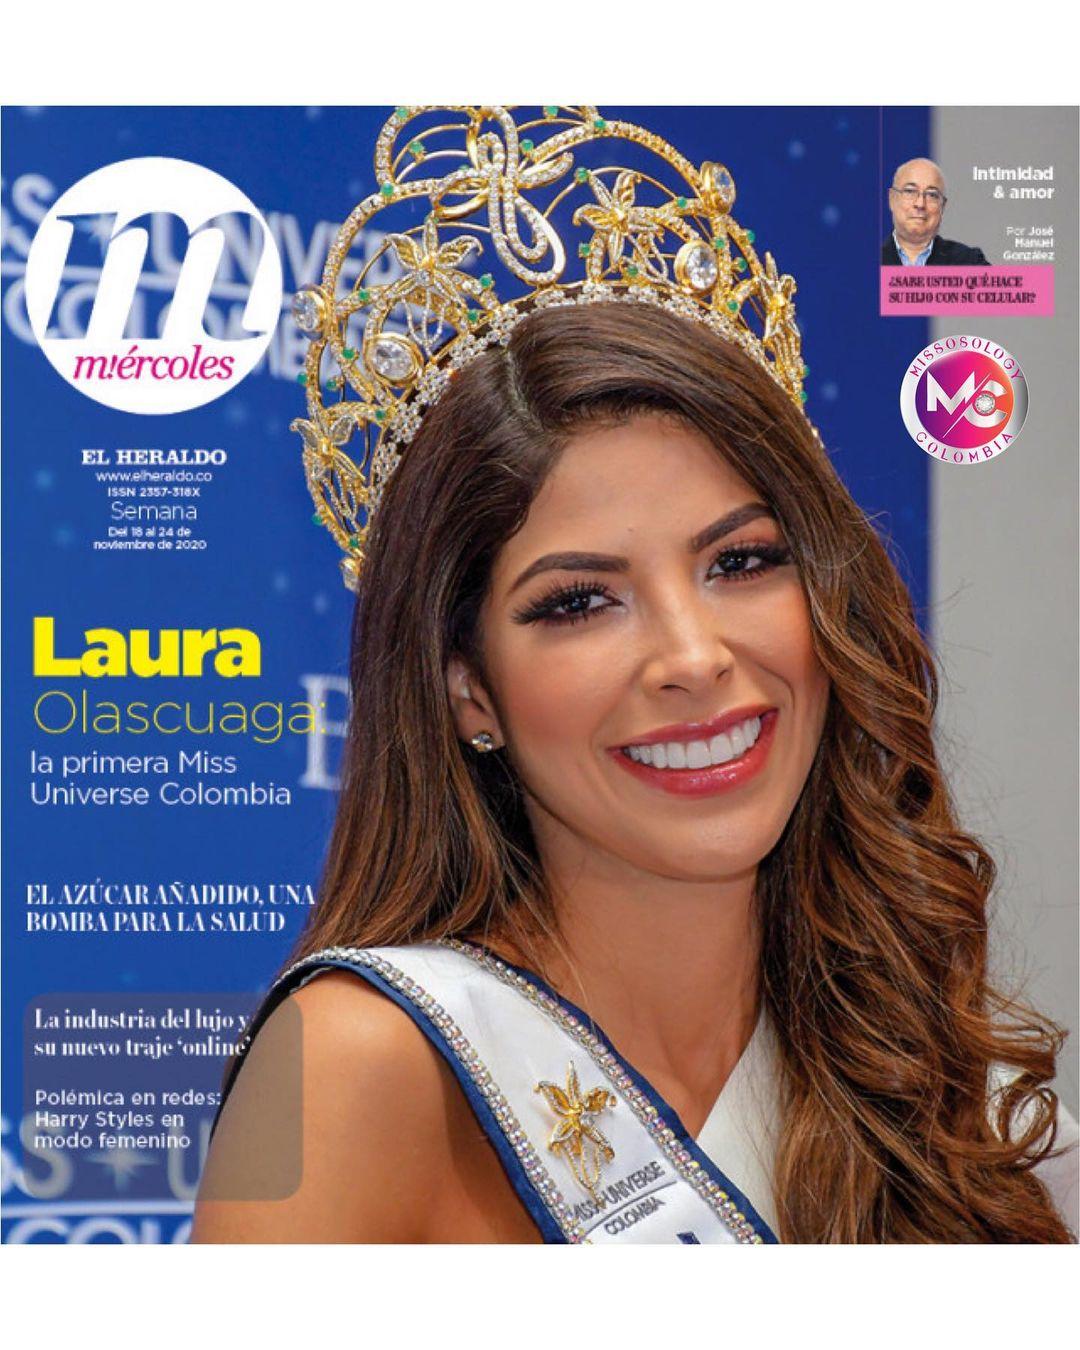 laura olascuaga, miss colombia universo 2020. - Página 5 Missos26